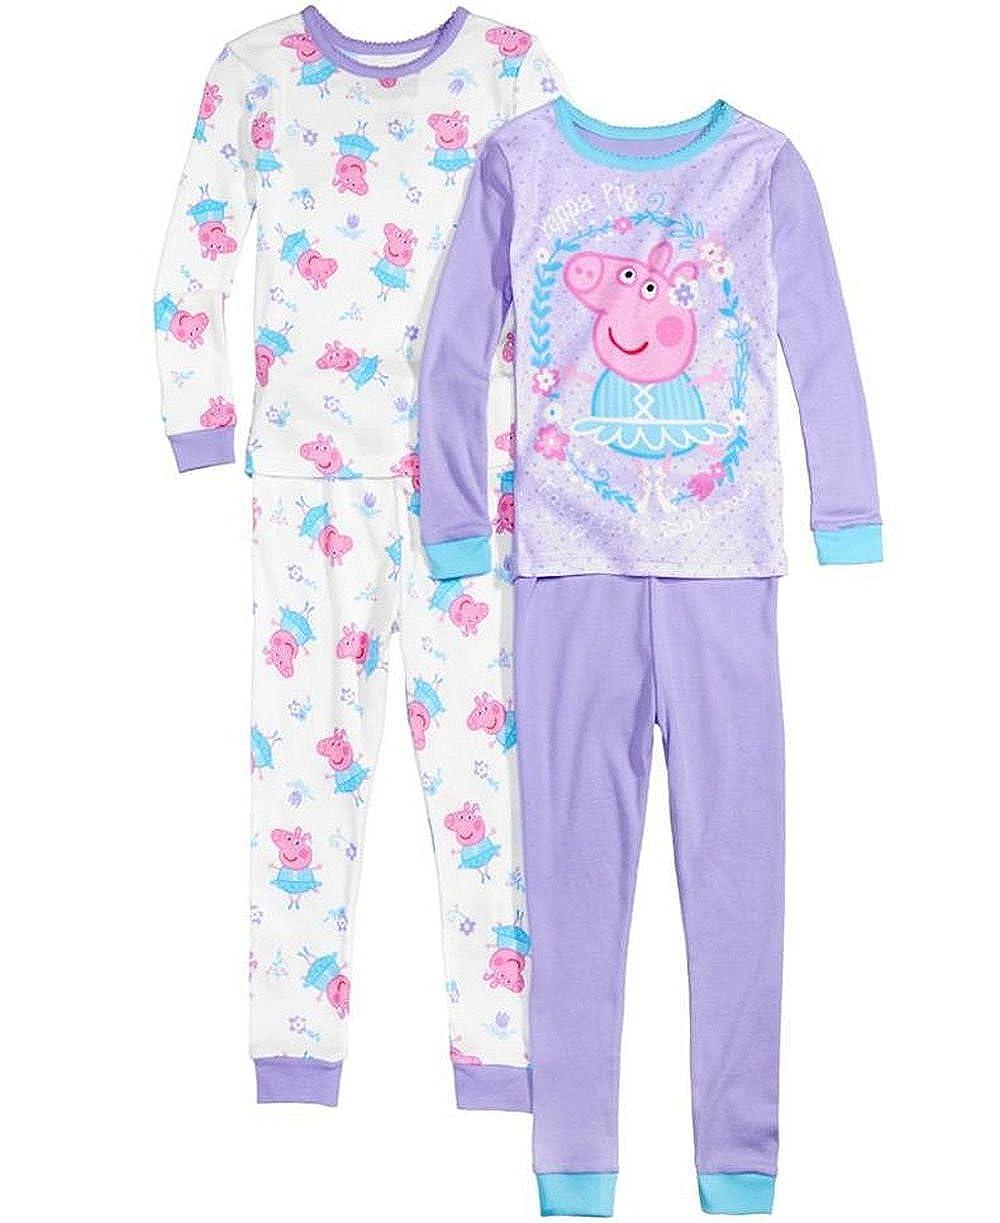 Komar Kids Peppa Pig Todder Girls 4-Piece Fairytale Ballerina Cotton Pajama Set